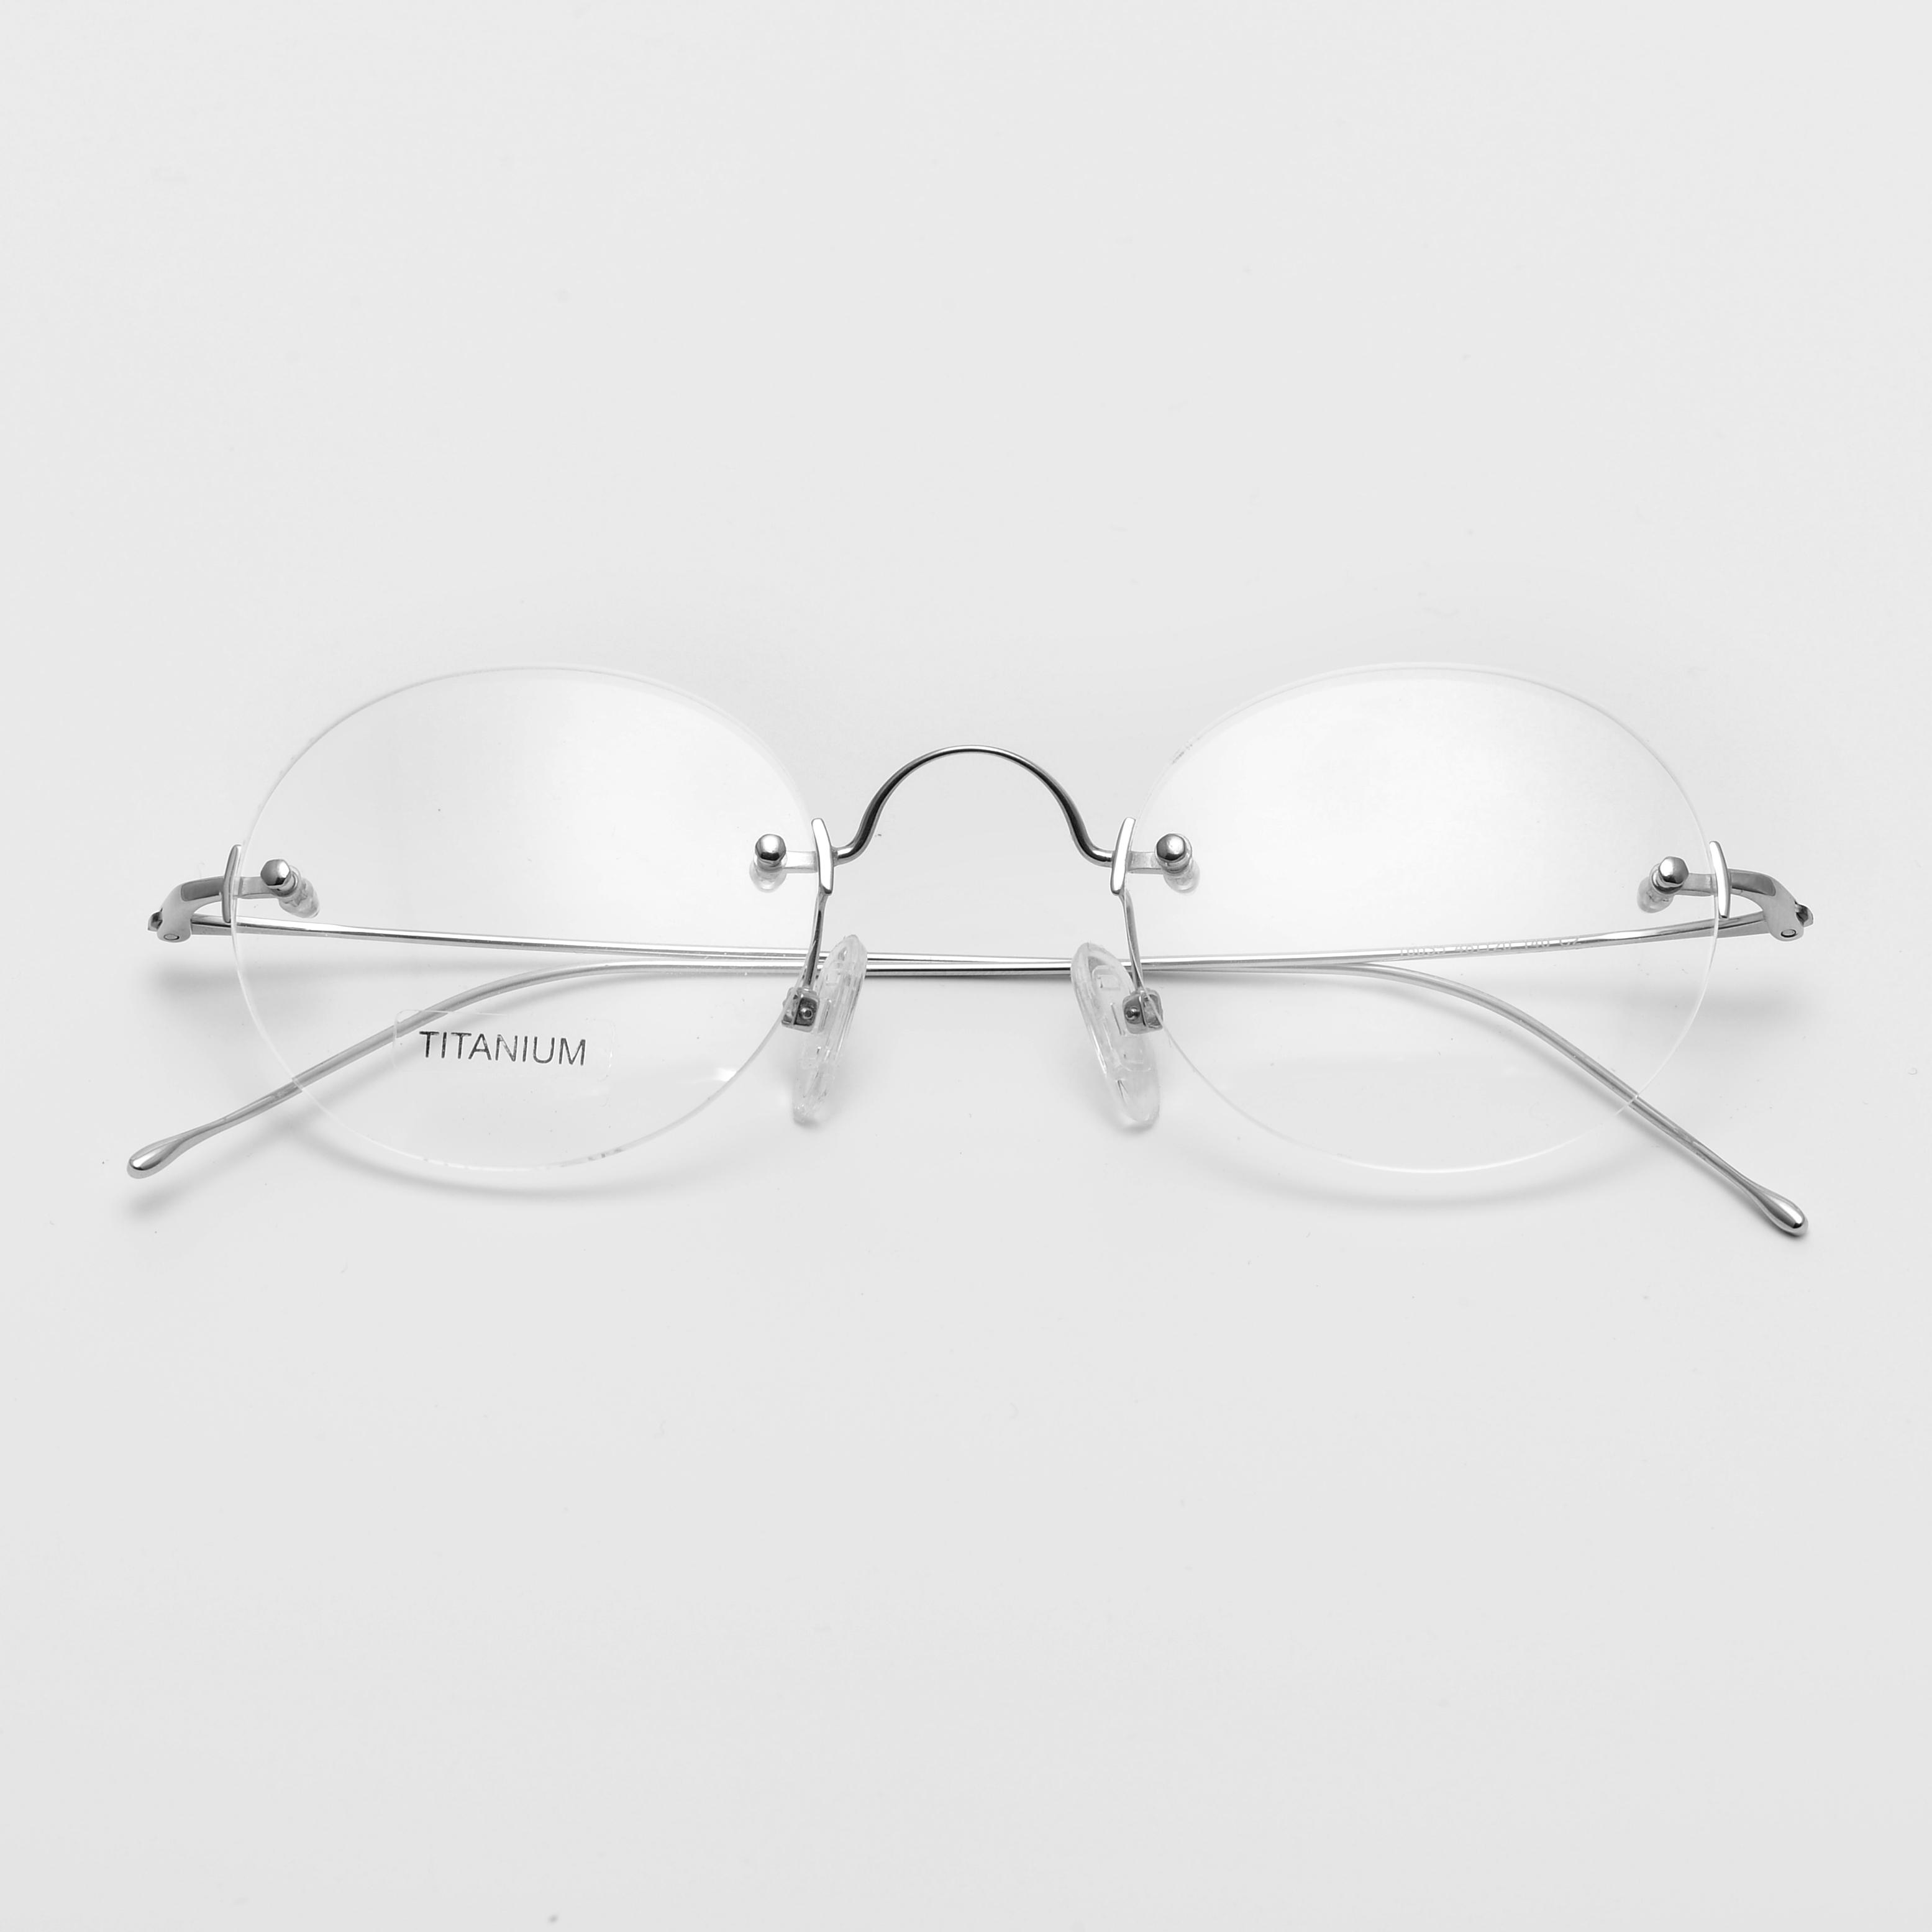 16035 Metal Titanium Stainless Steel Hot Sale Popular Eyewear Frames Glasses